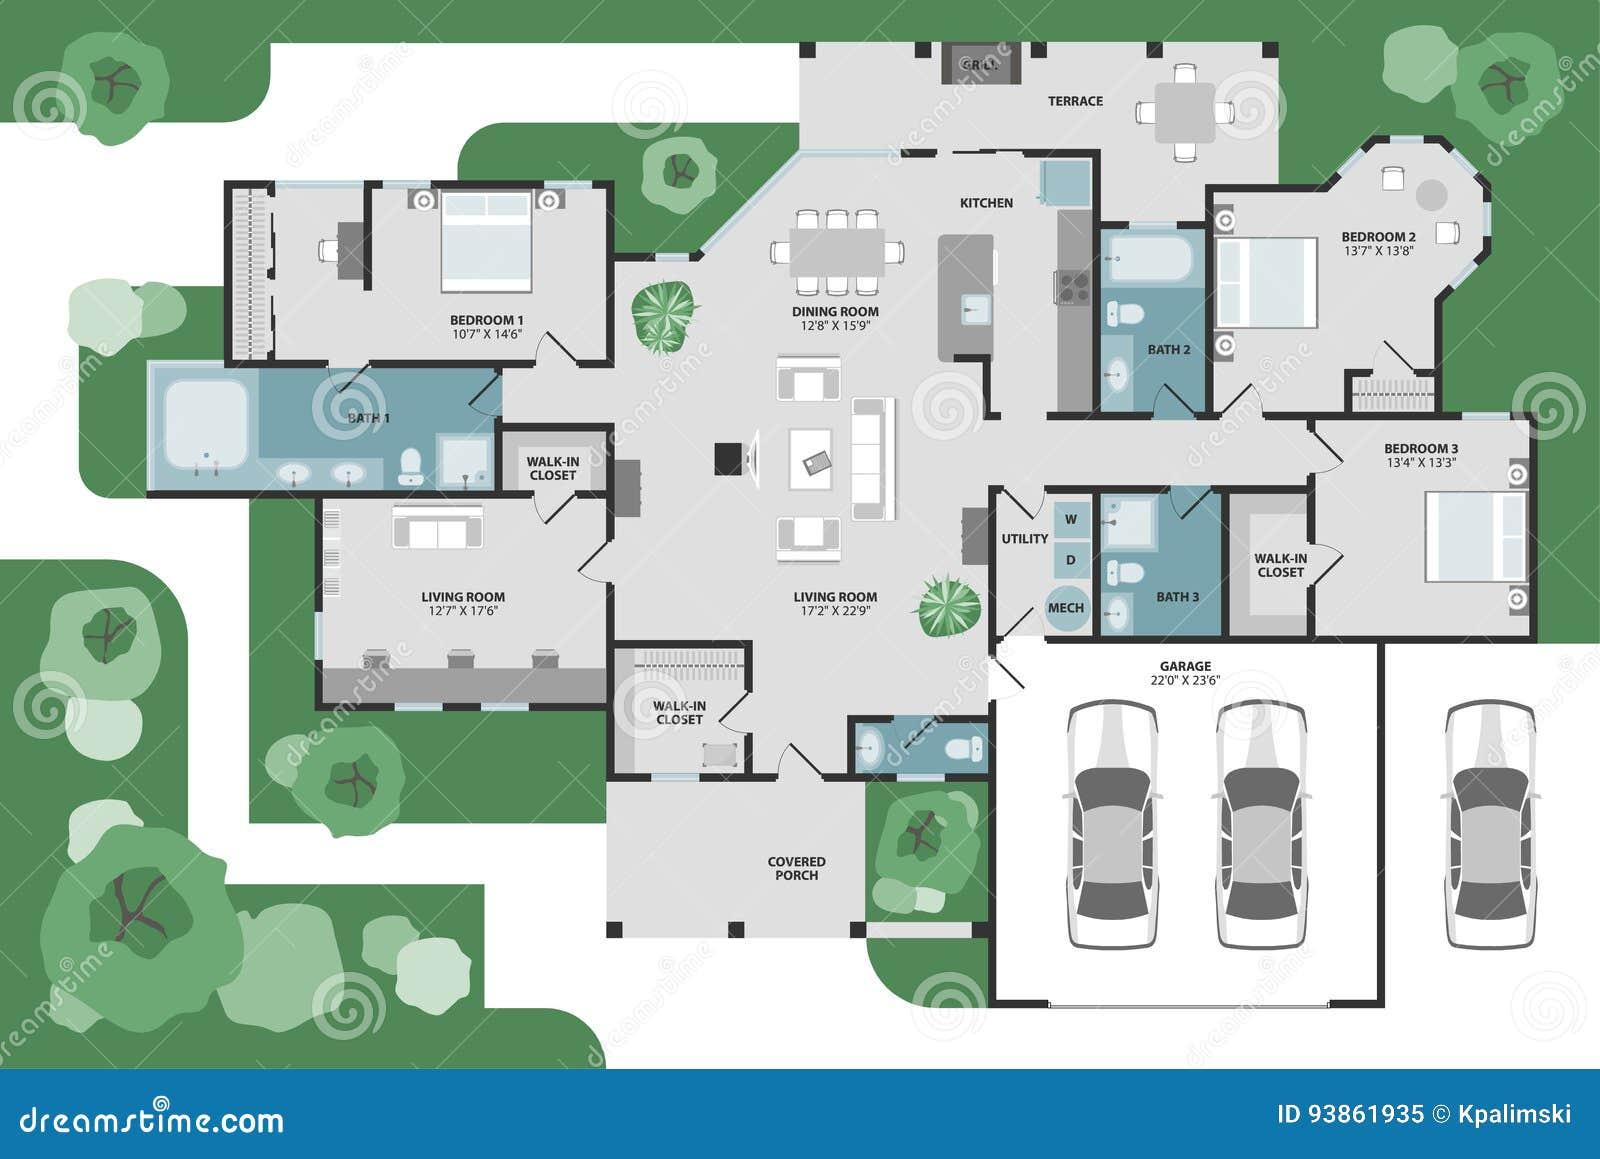 Vector Floor Plan Of A House Stock Vector